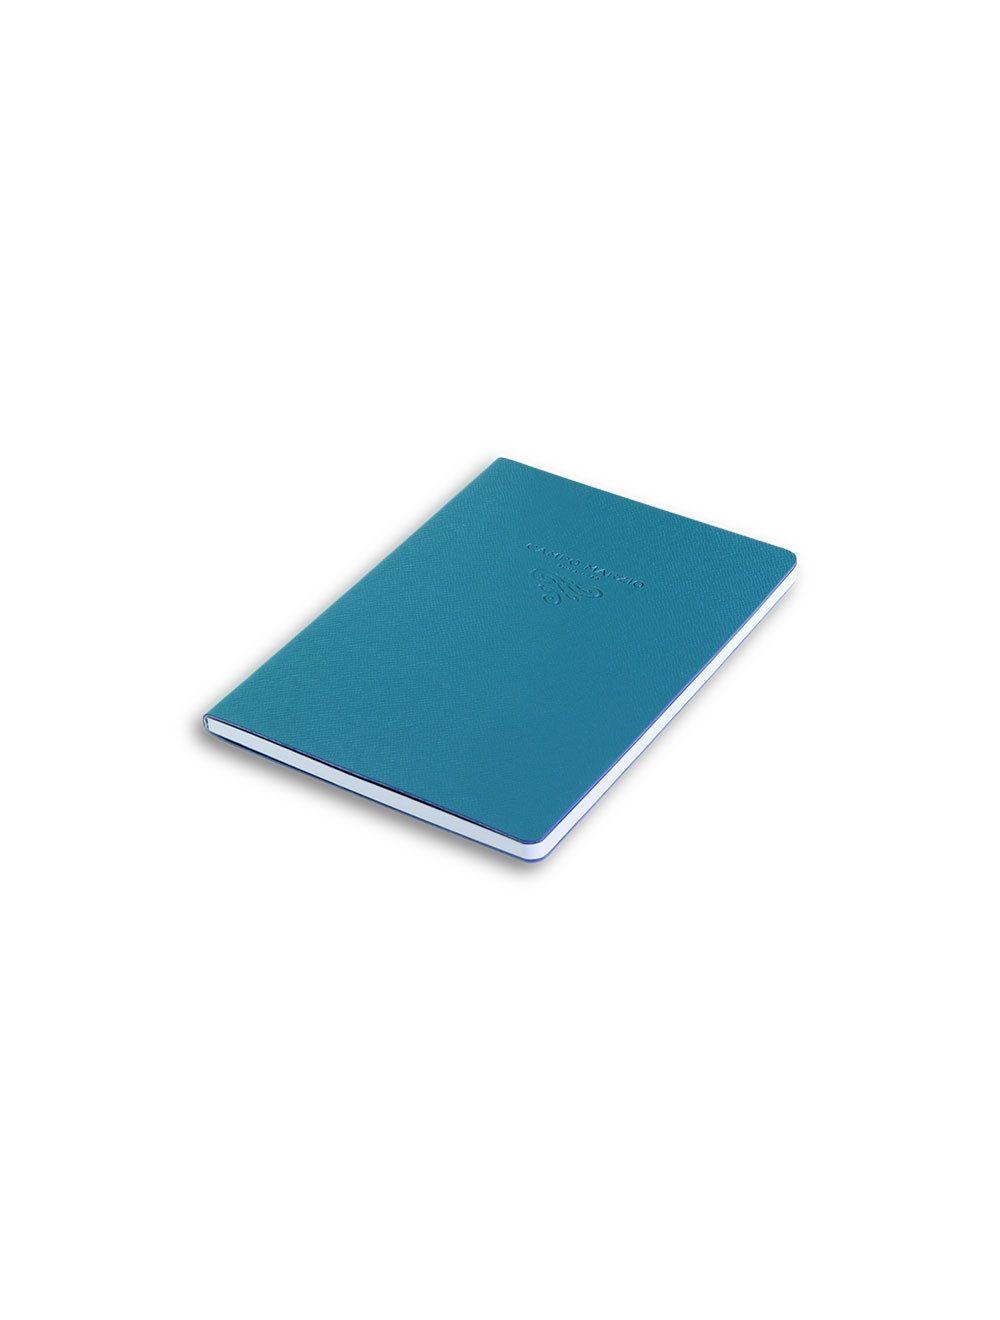 Journal 16,5 X 23,4 Cm - White Internal Paper  - Avion